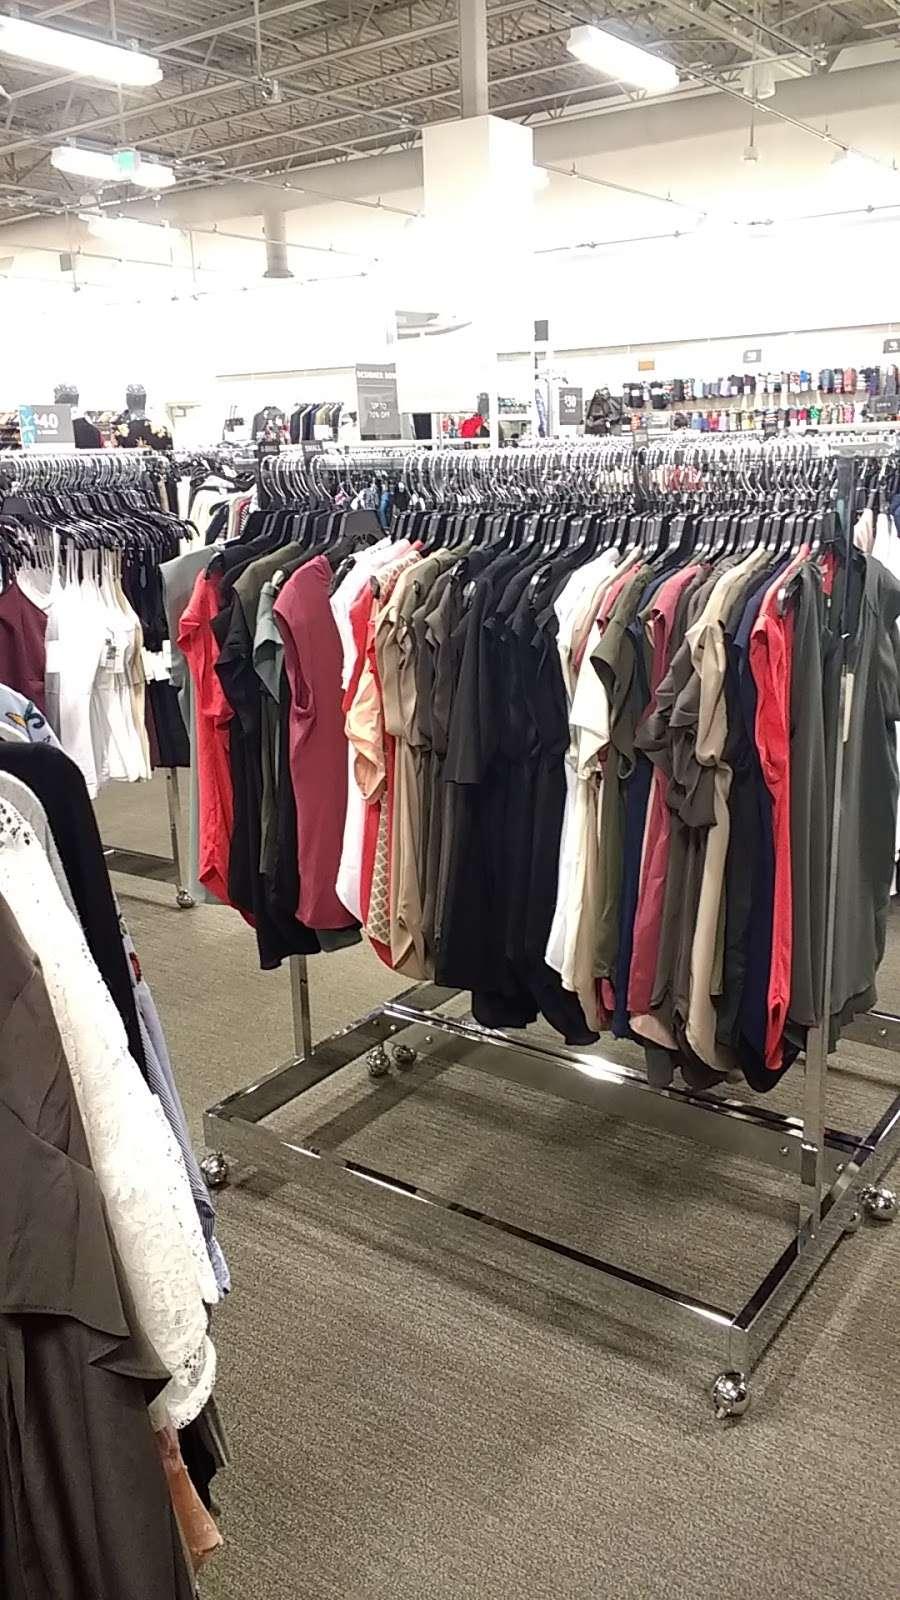 Nordstrom Rack Schererville - clothing store  | Photo 7 of 10 | Address: 185 US-41, Schererville, IN 46375, USA | Phone: (219) 227-3960